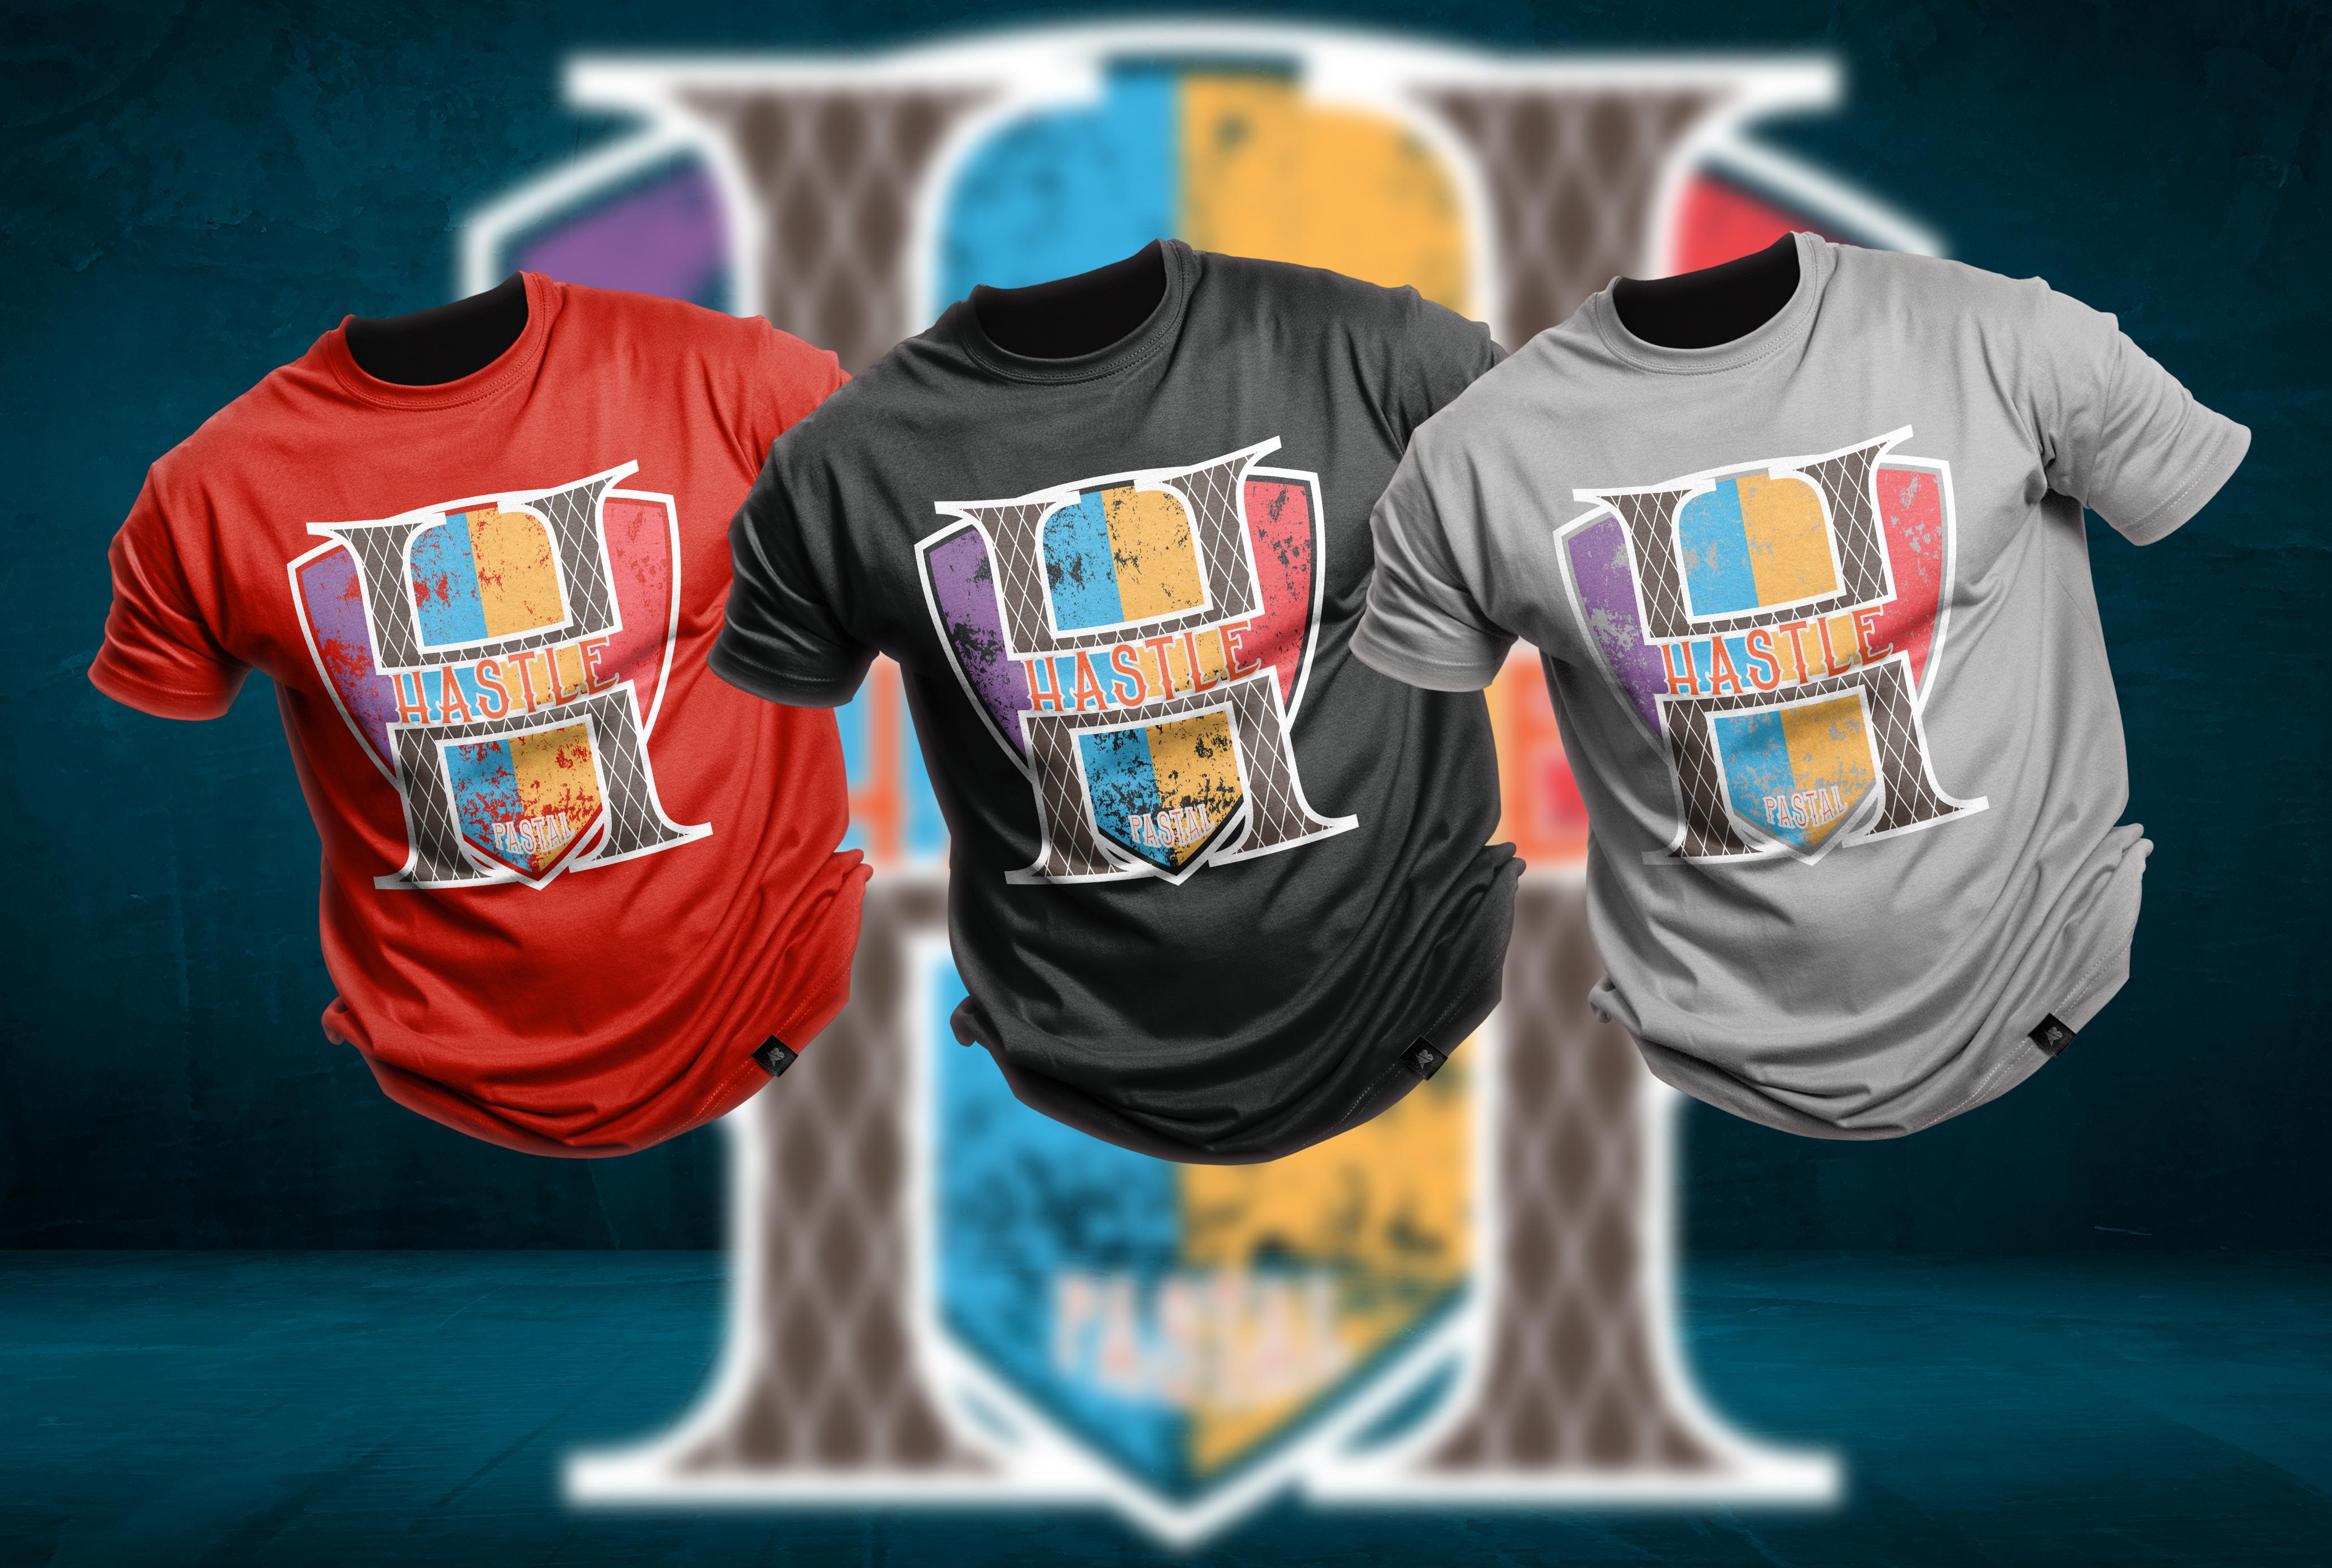 I will turn your idea into amazing custom t shirt design